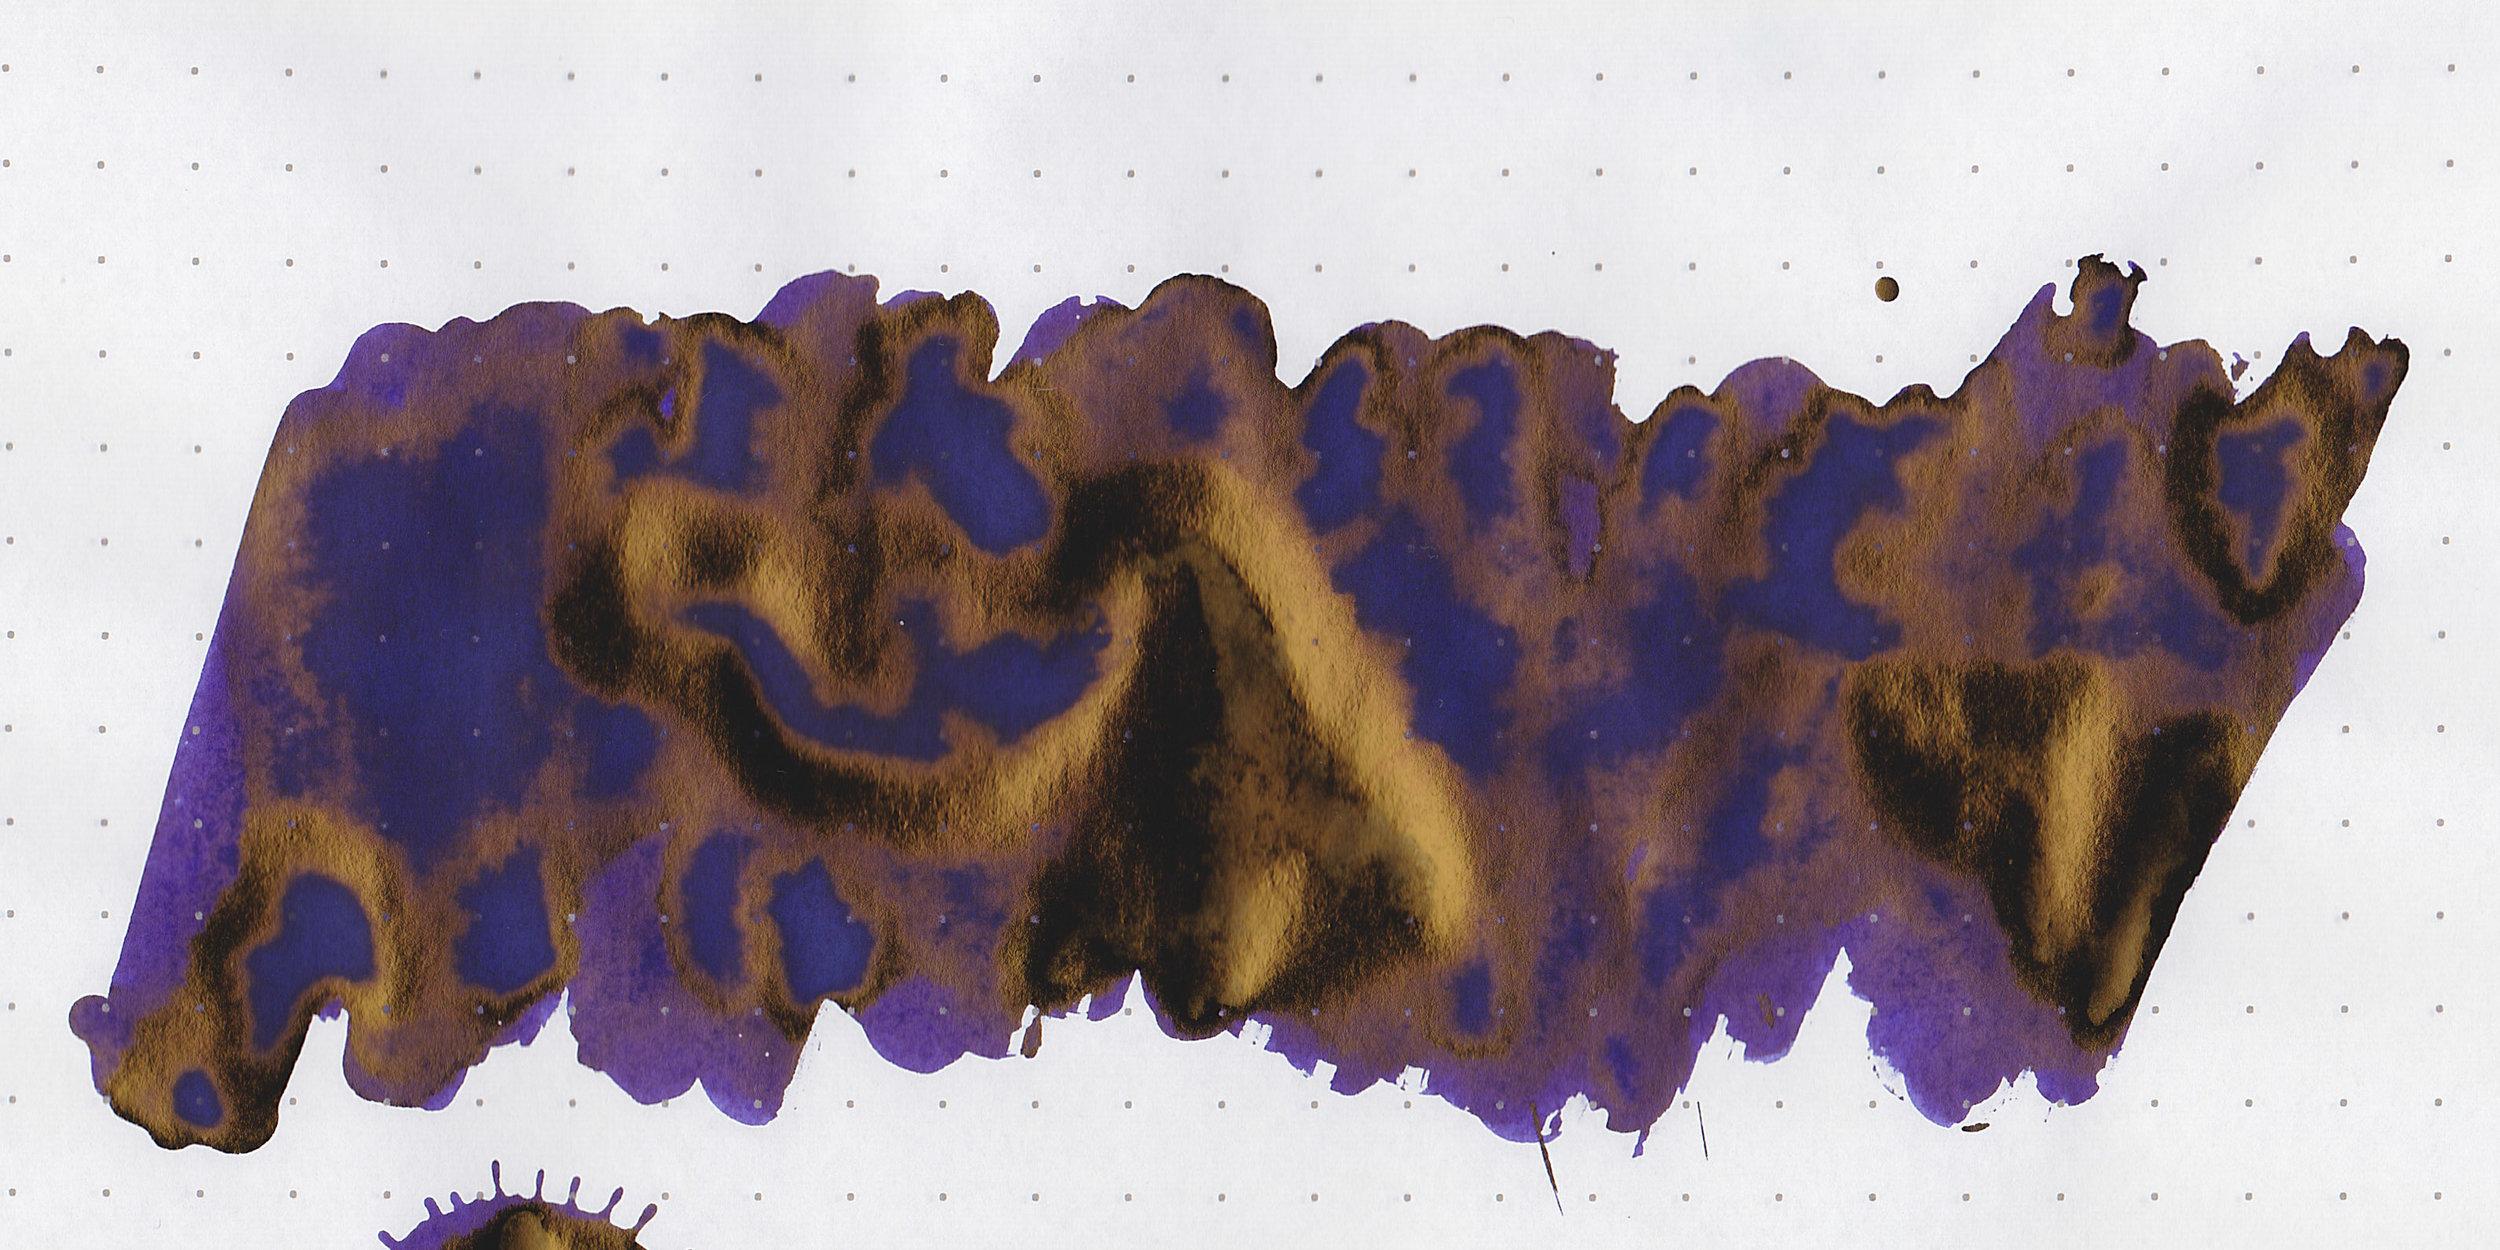 d-purple-rain-12.jpg